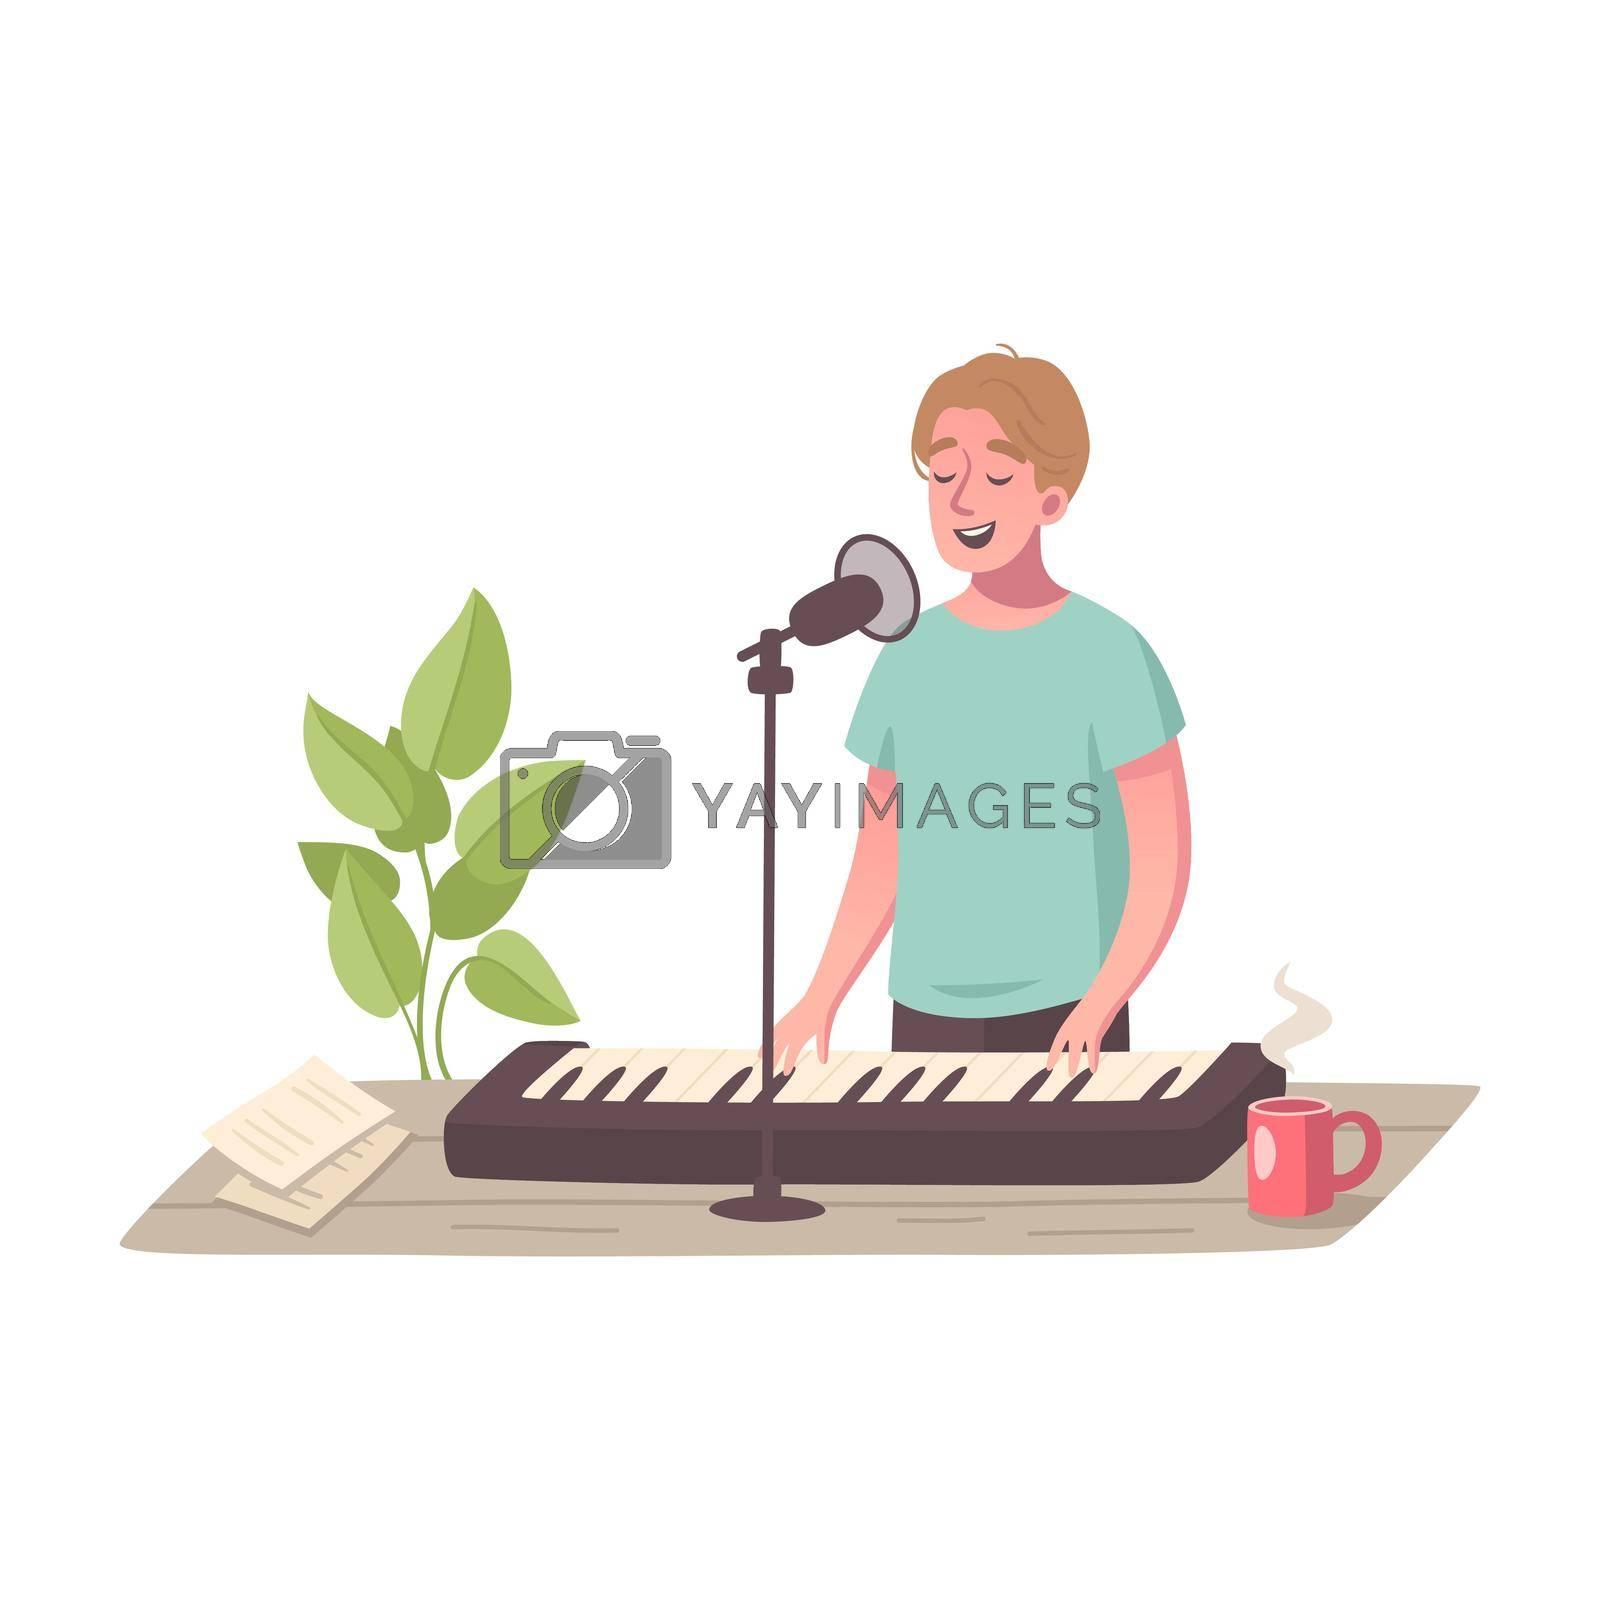 Royalty free image of Music Hobby Cartoon Composition by mstjahanara